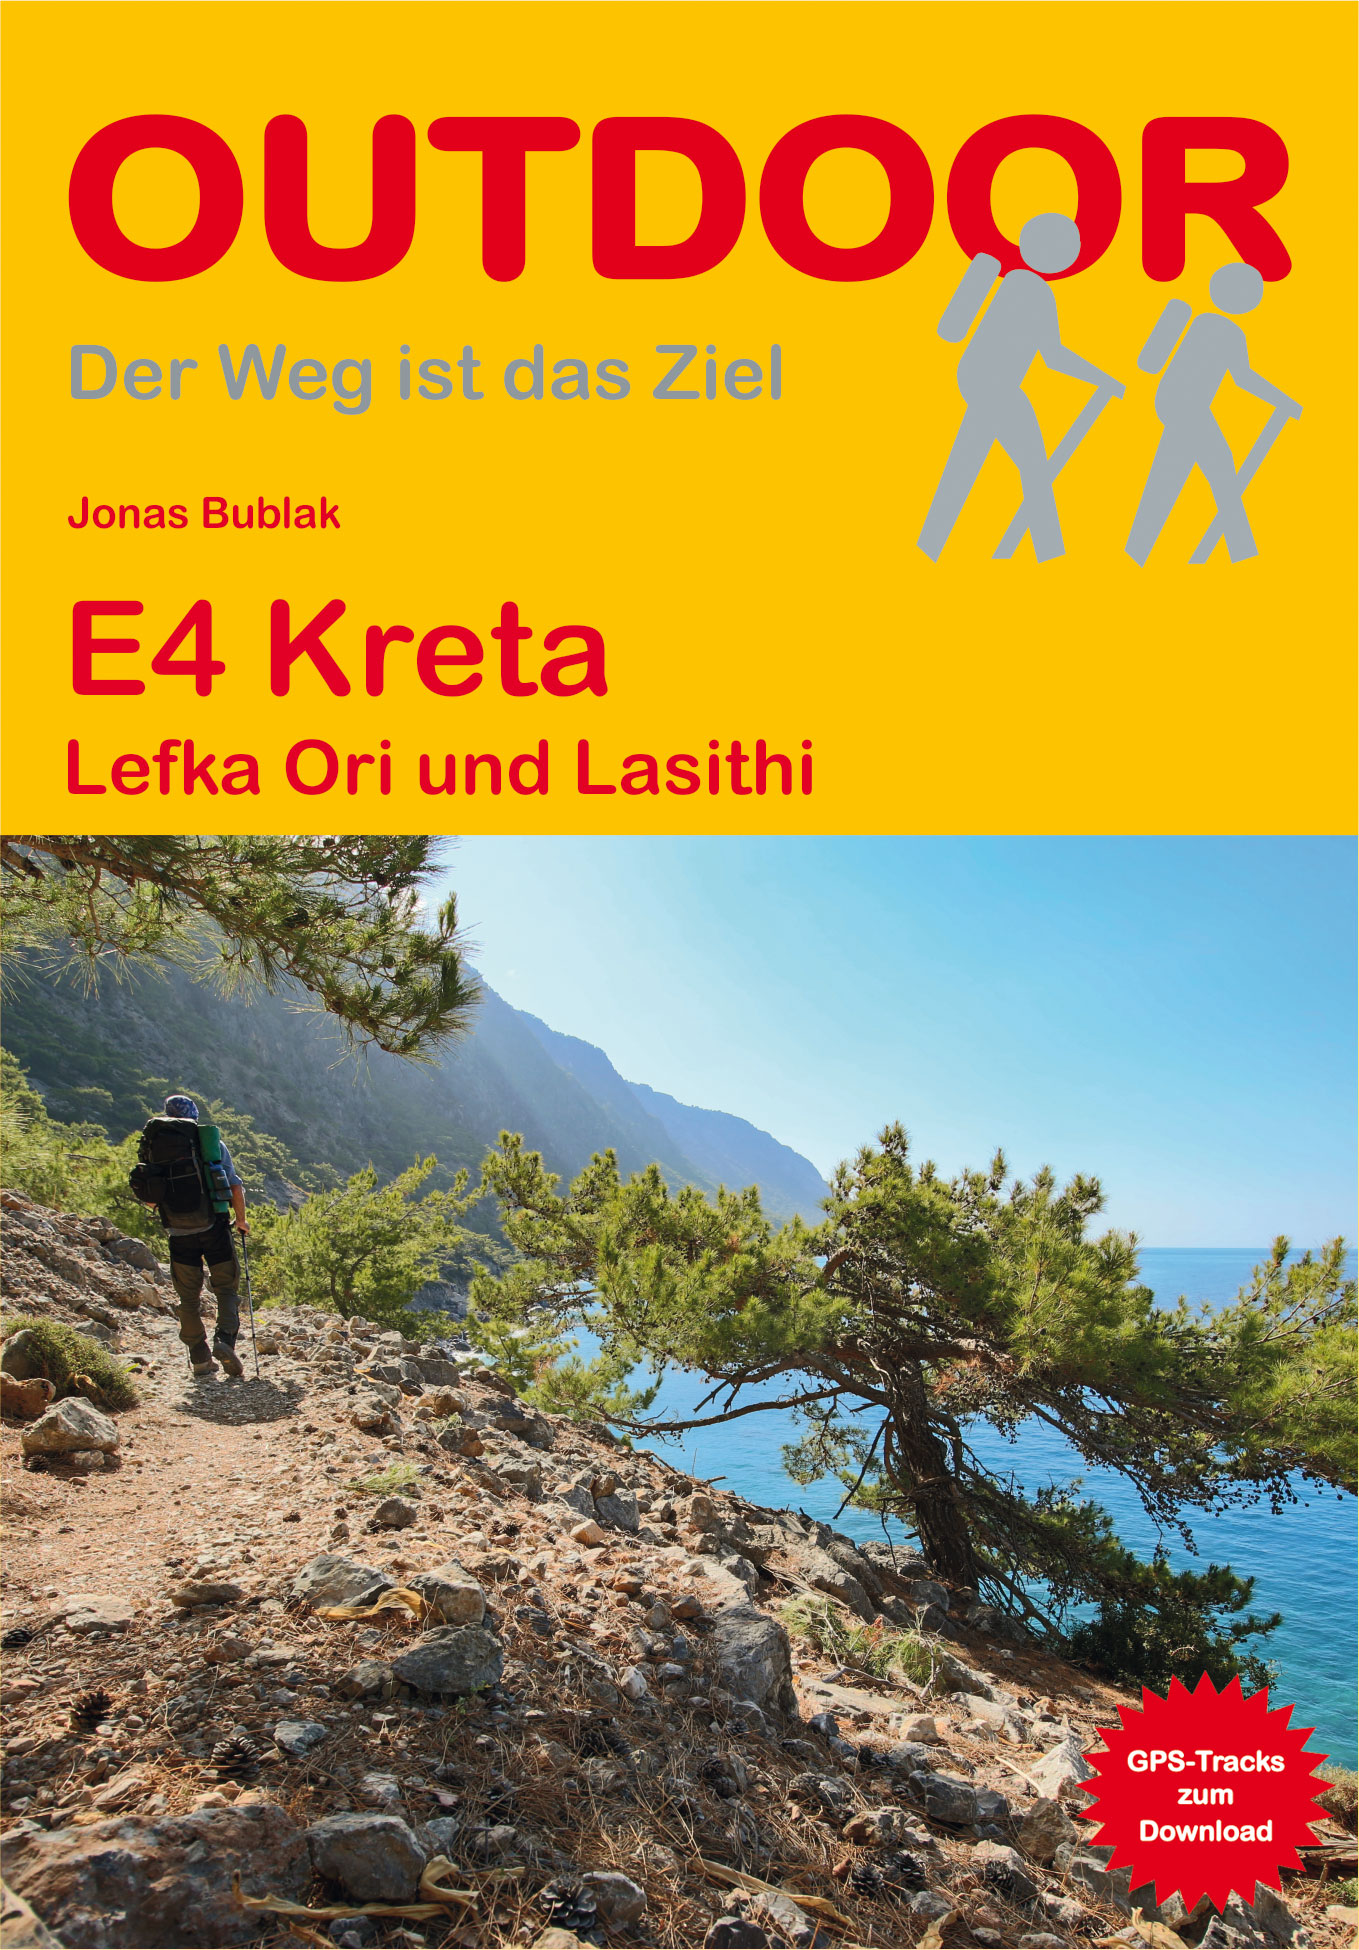 E4 Kreta